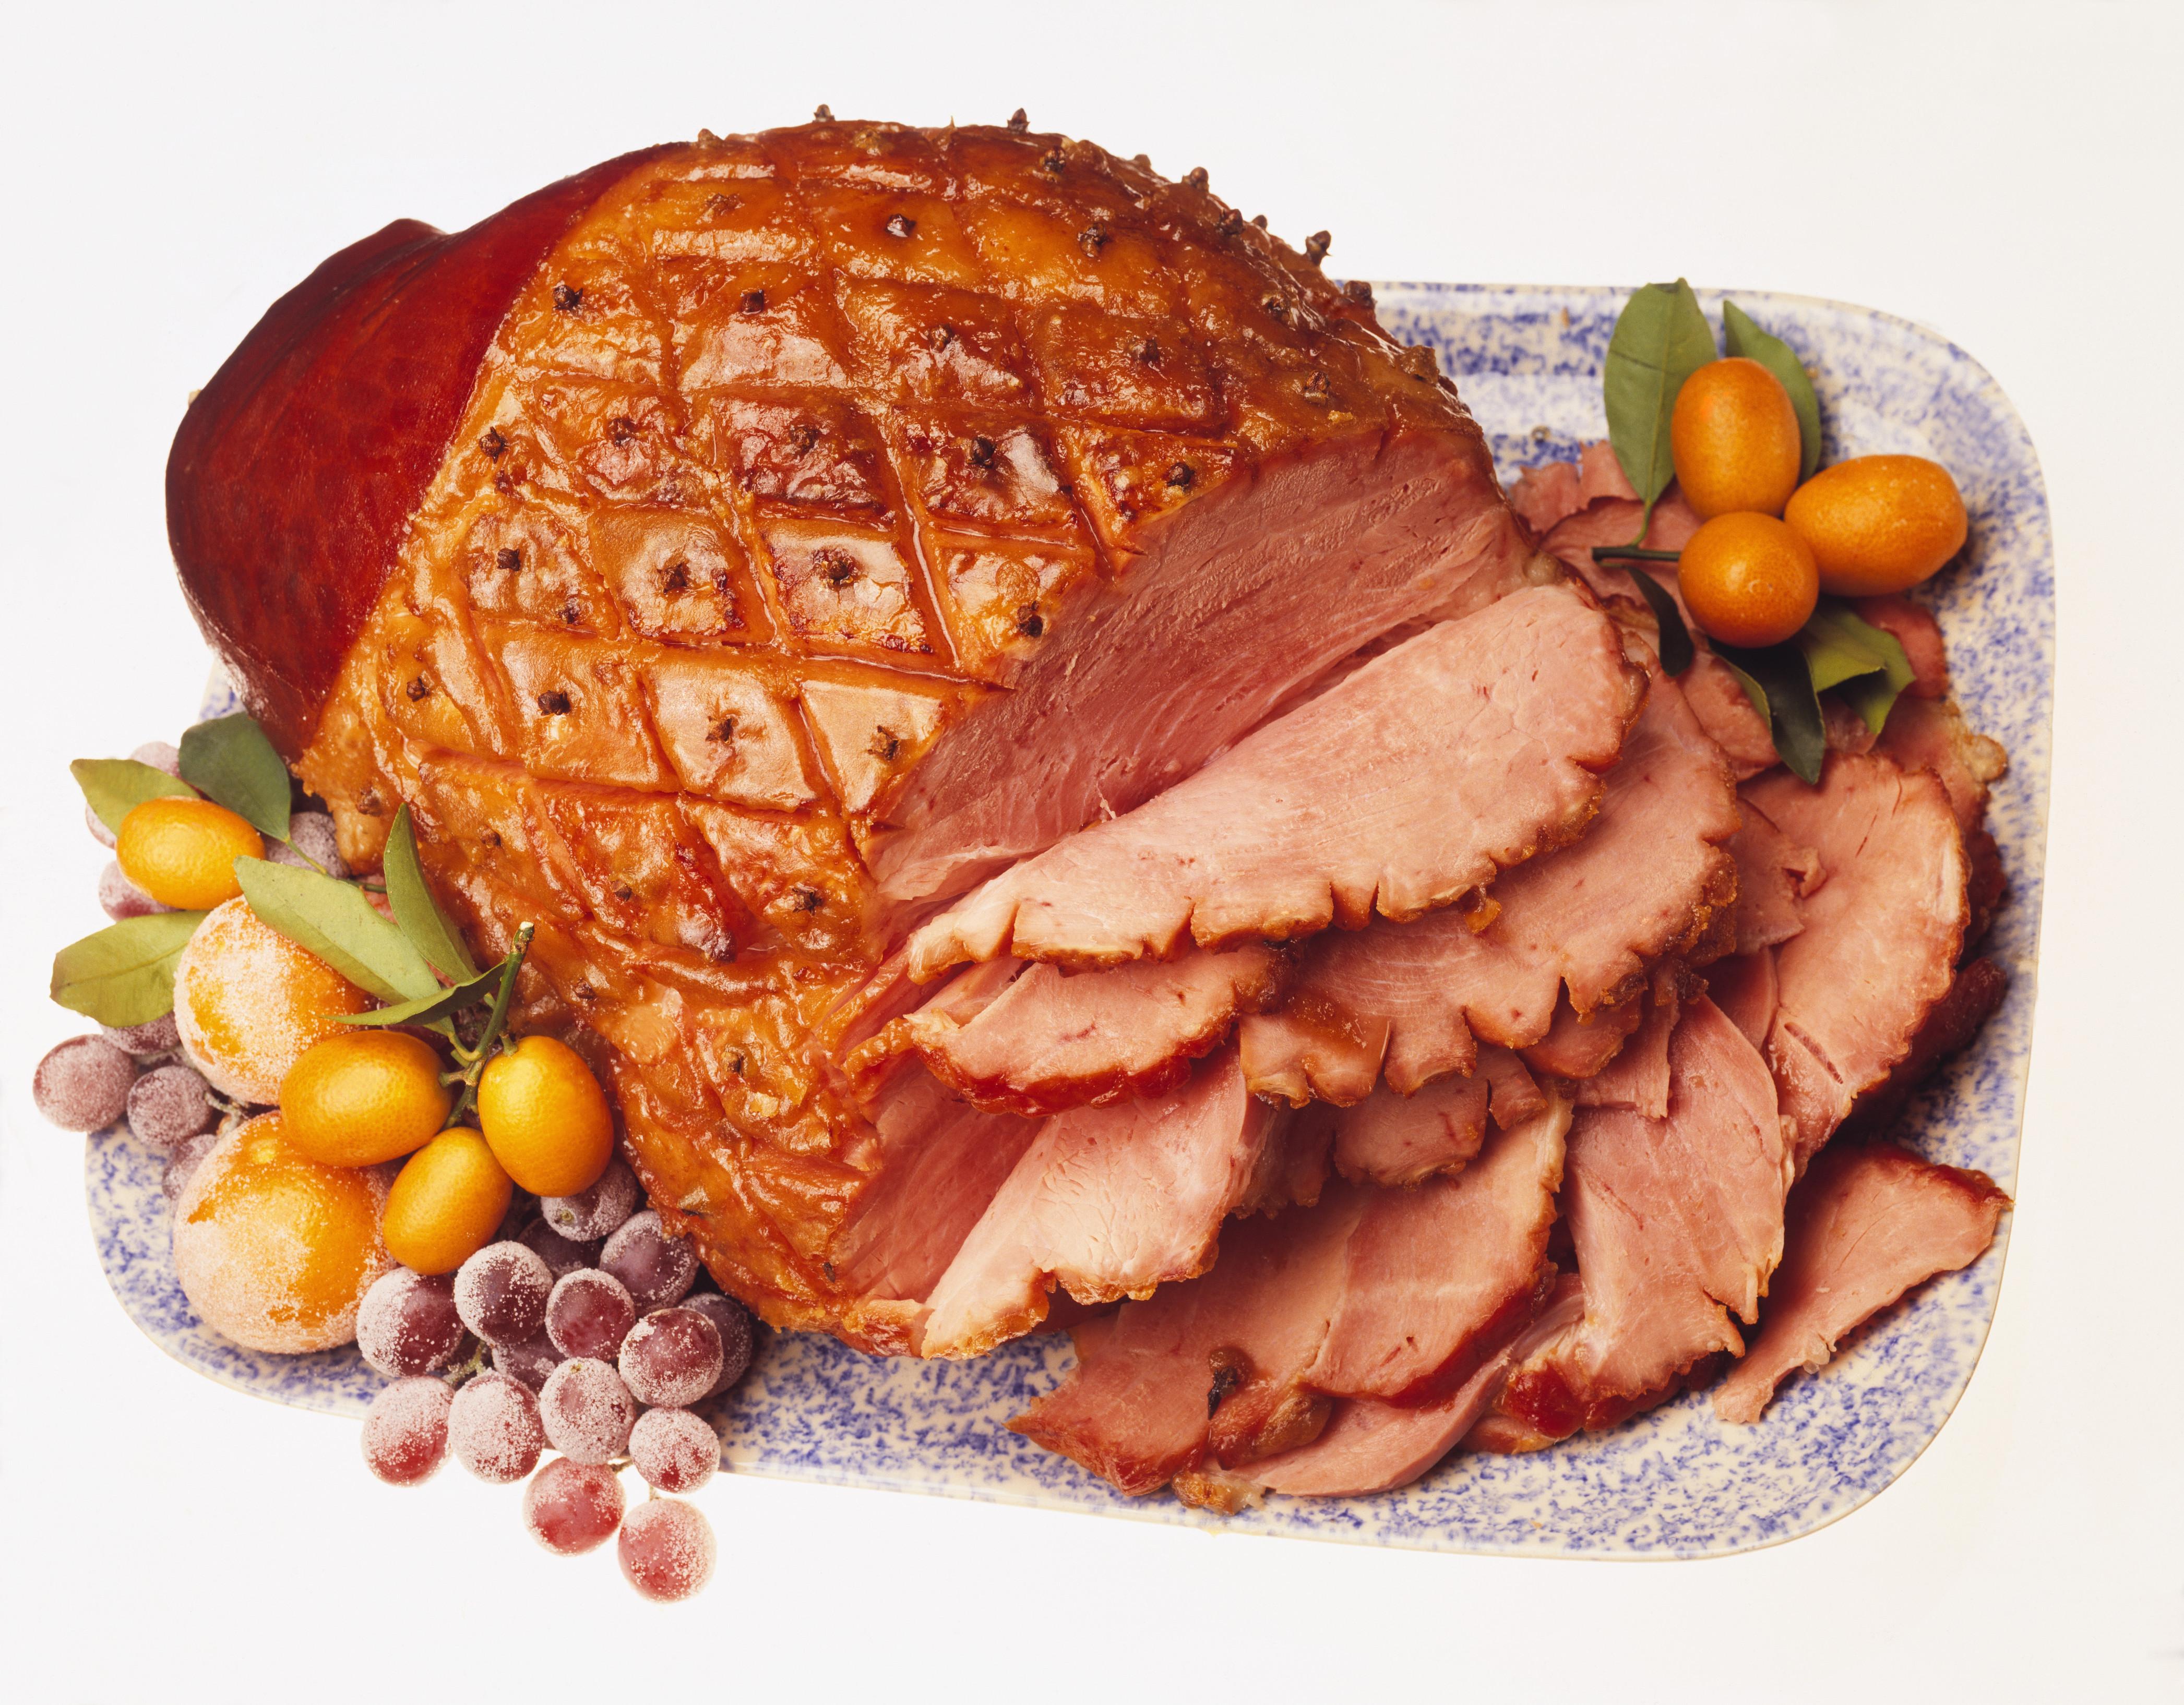 Recipes For Easter Ham  Baked Easter Ham Recipe — Dishmaps